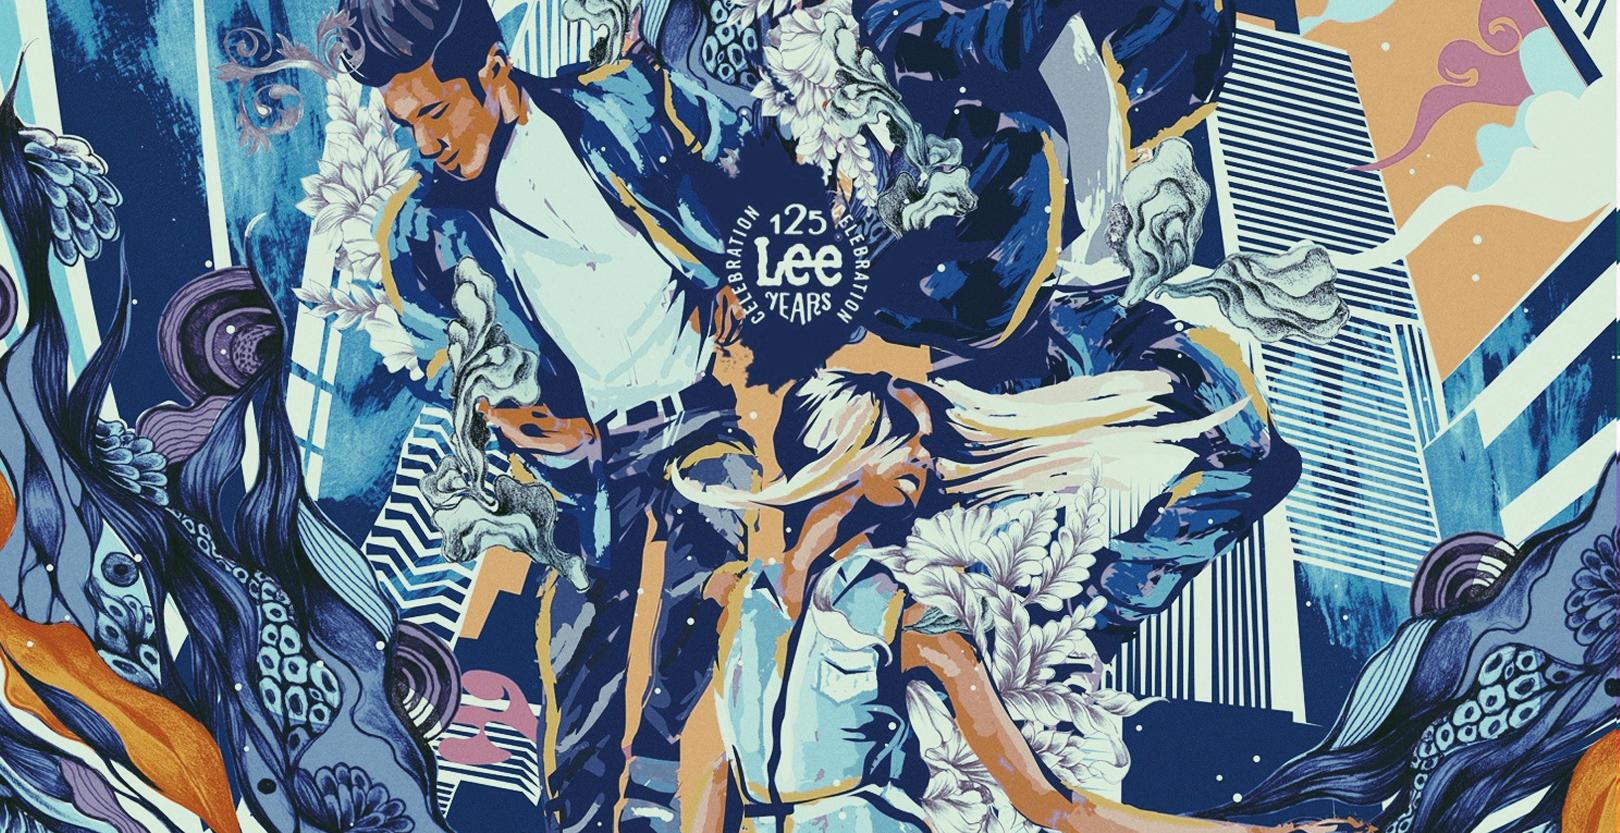 Lee Jeans Ph: 125 Years